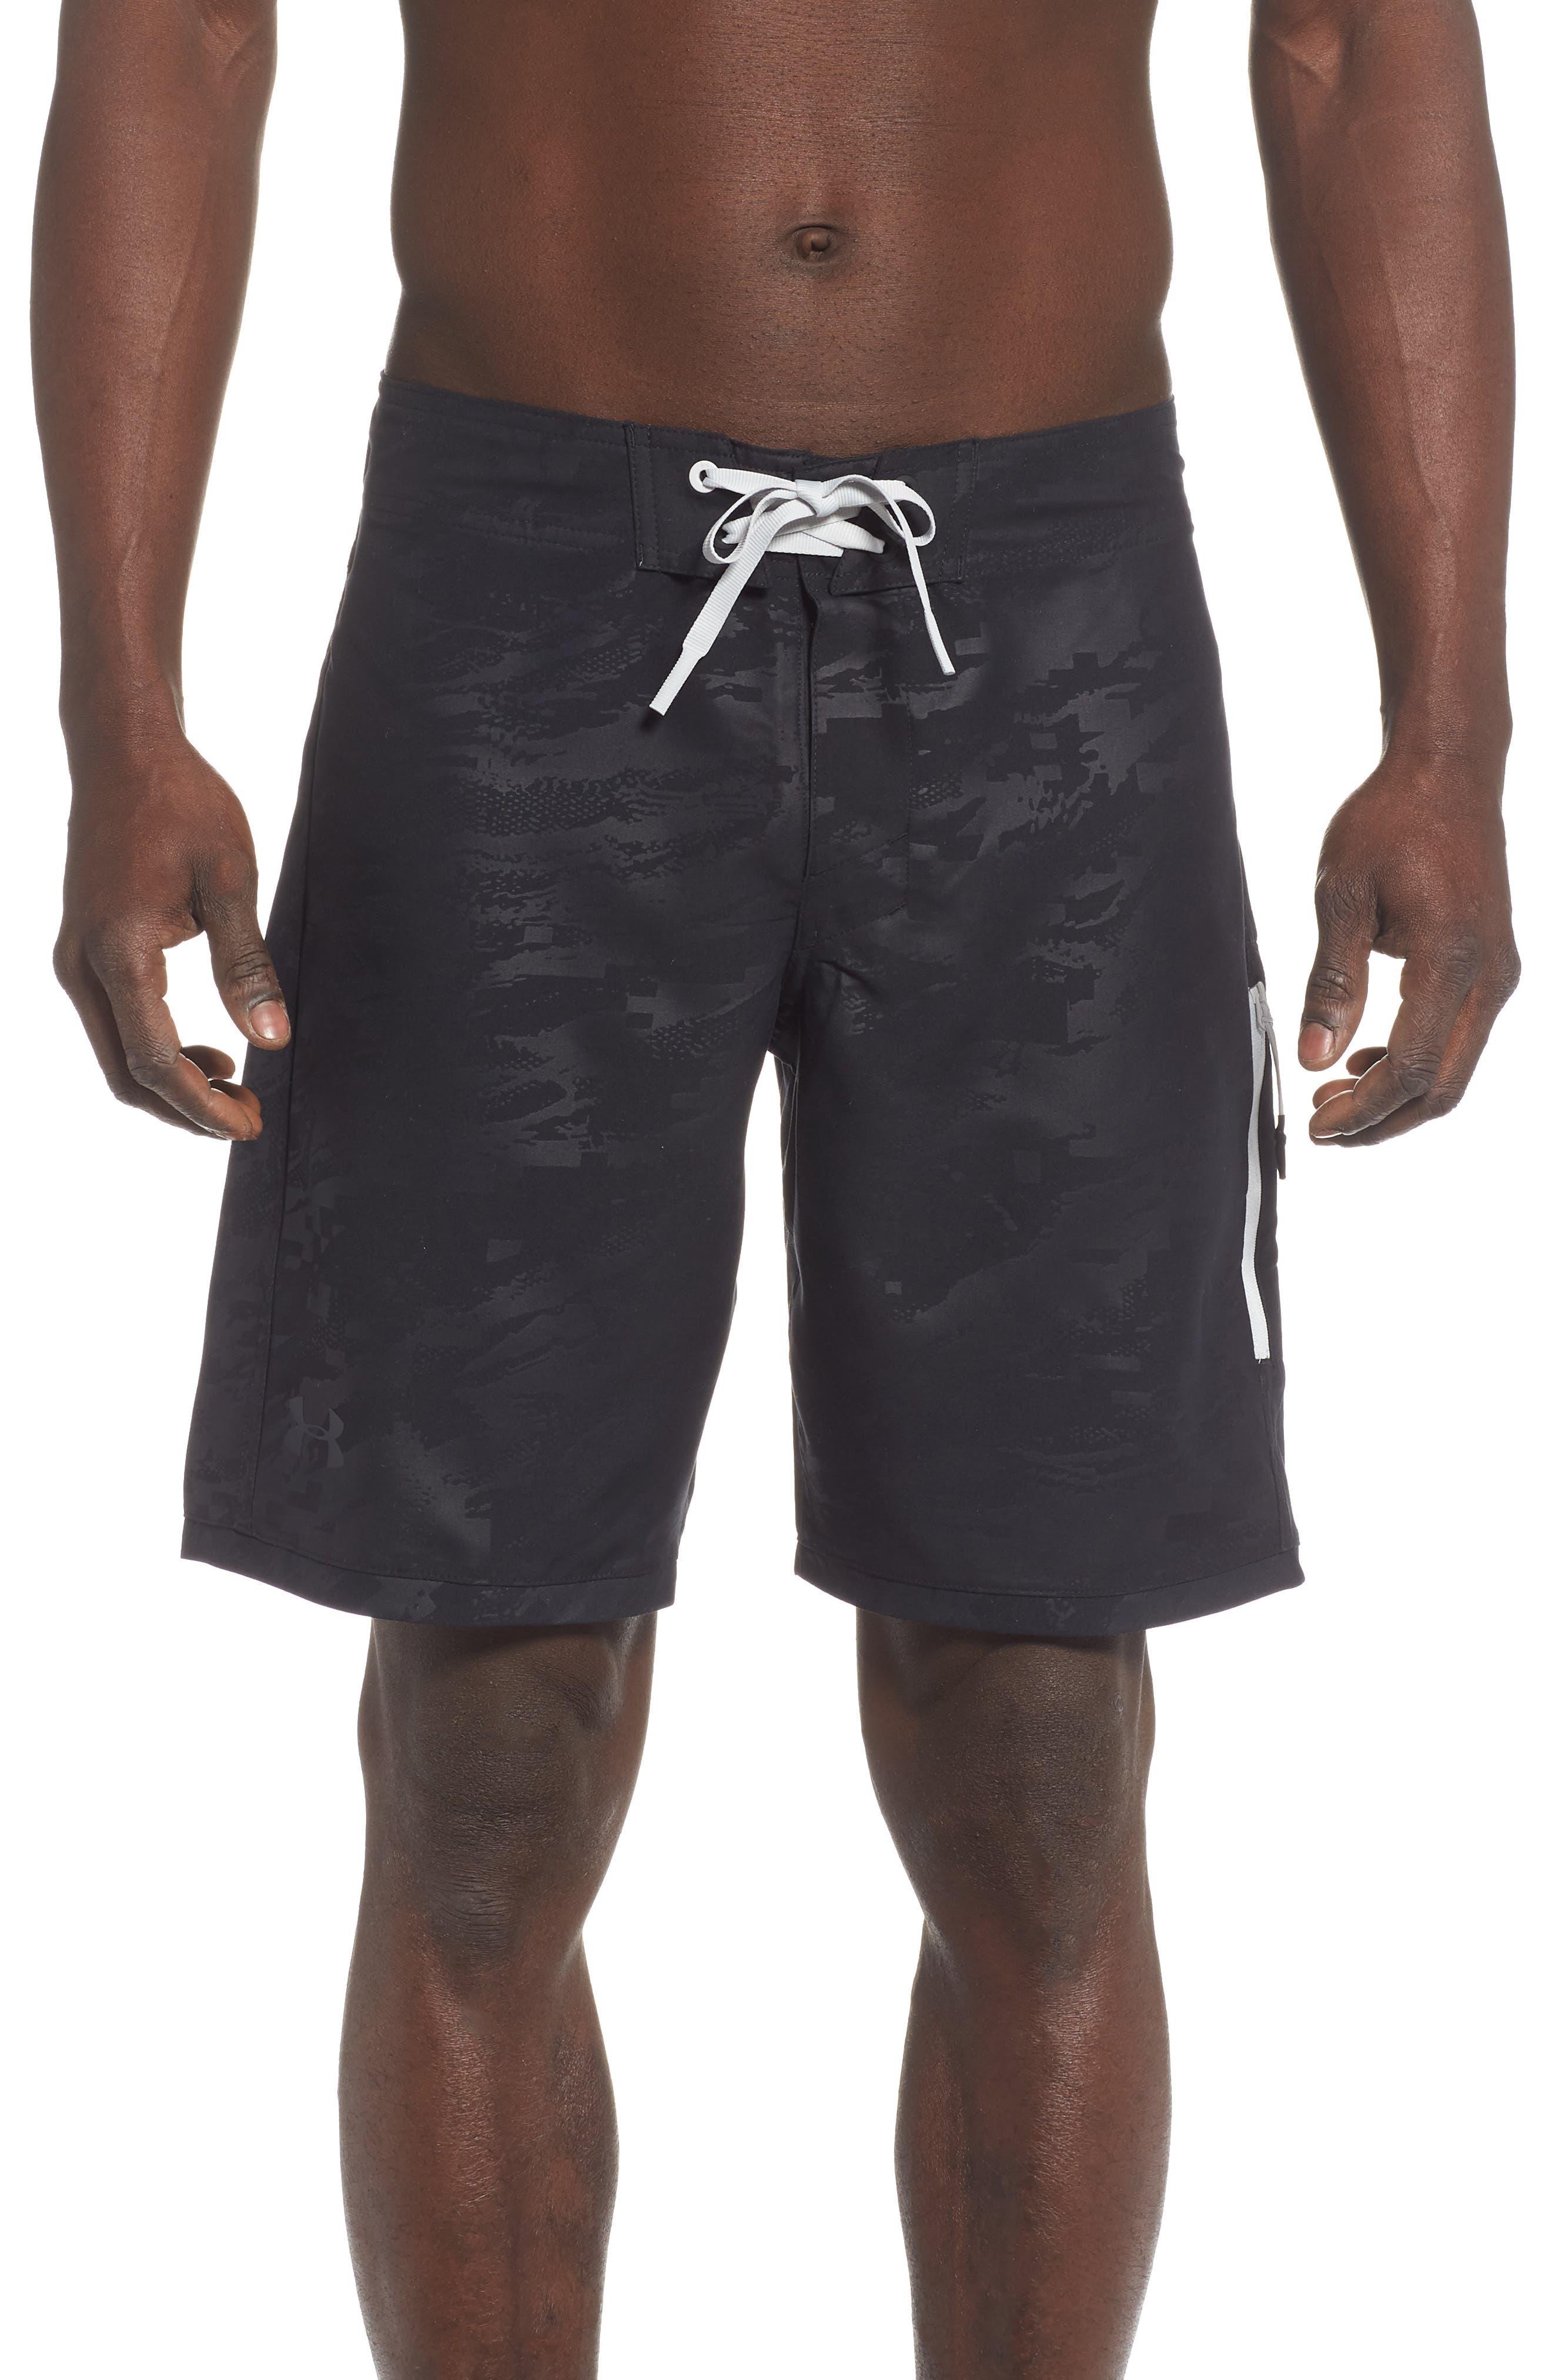 Under Armour Short Break Embossed Board Shorts, Black